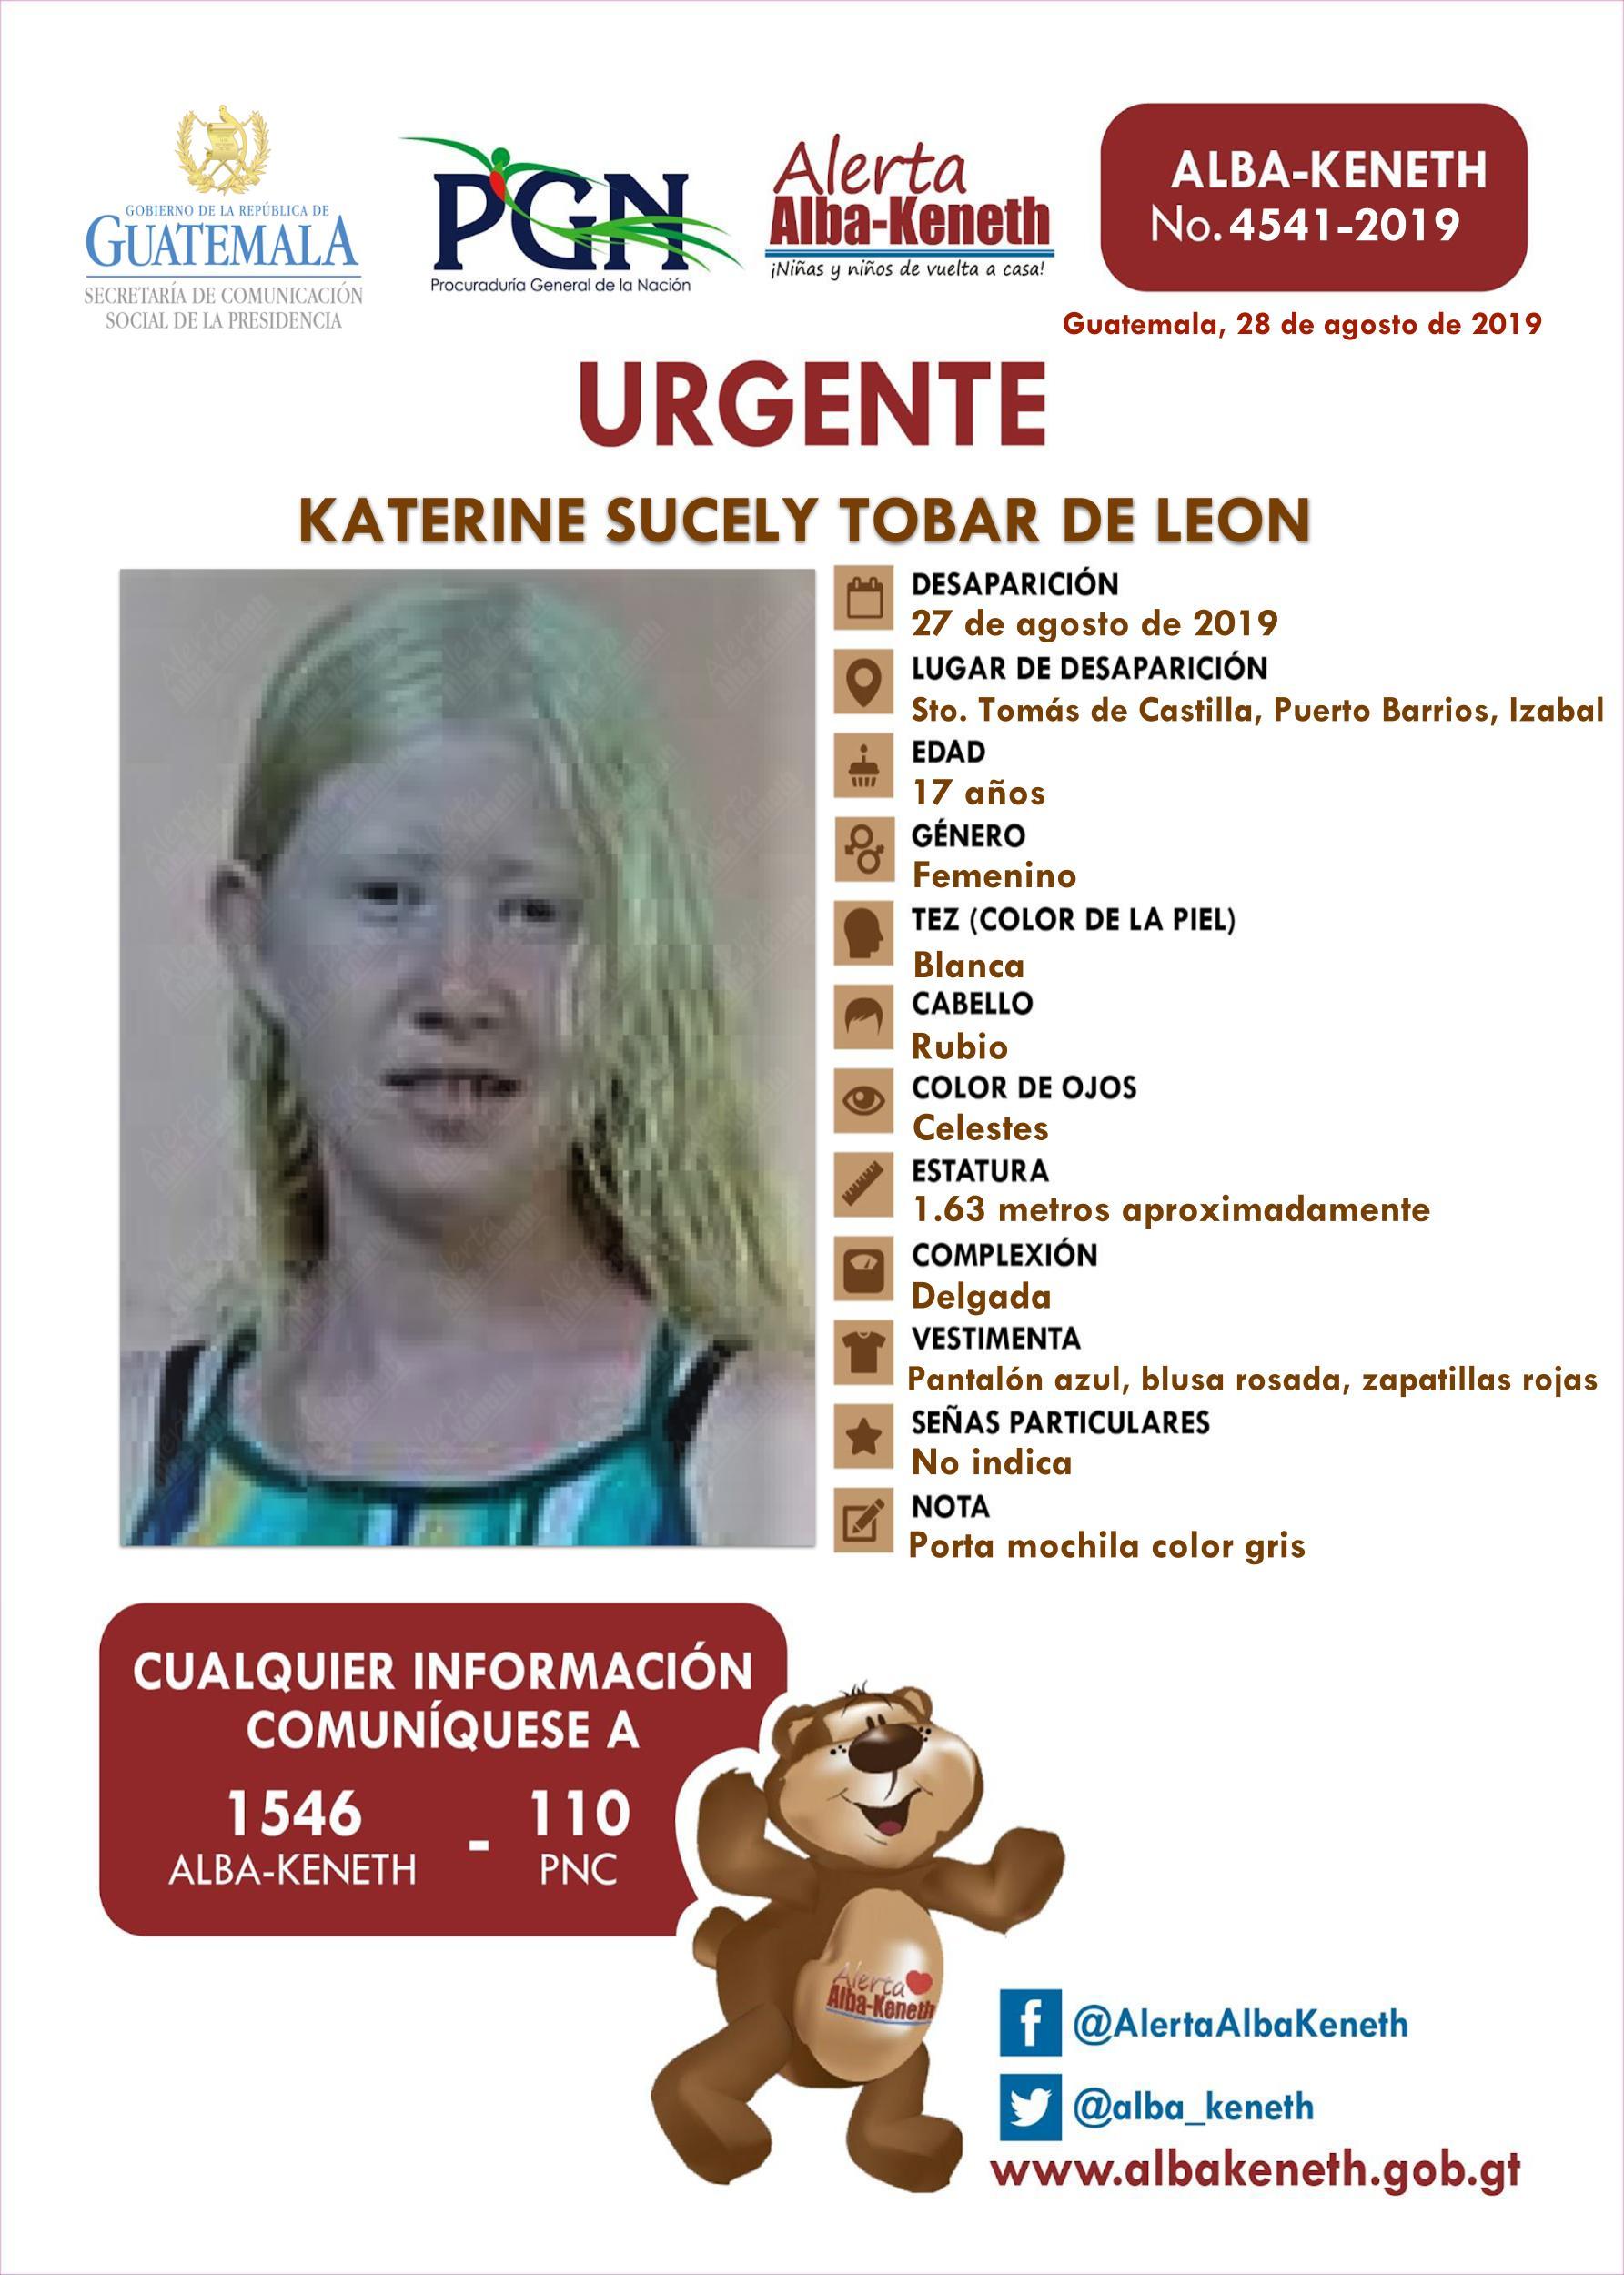 Katerine Sucely Tobar de Leon